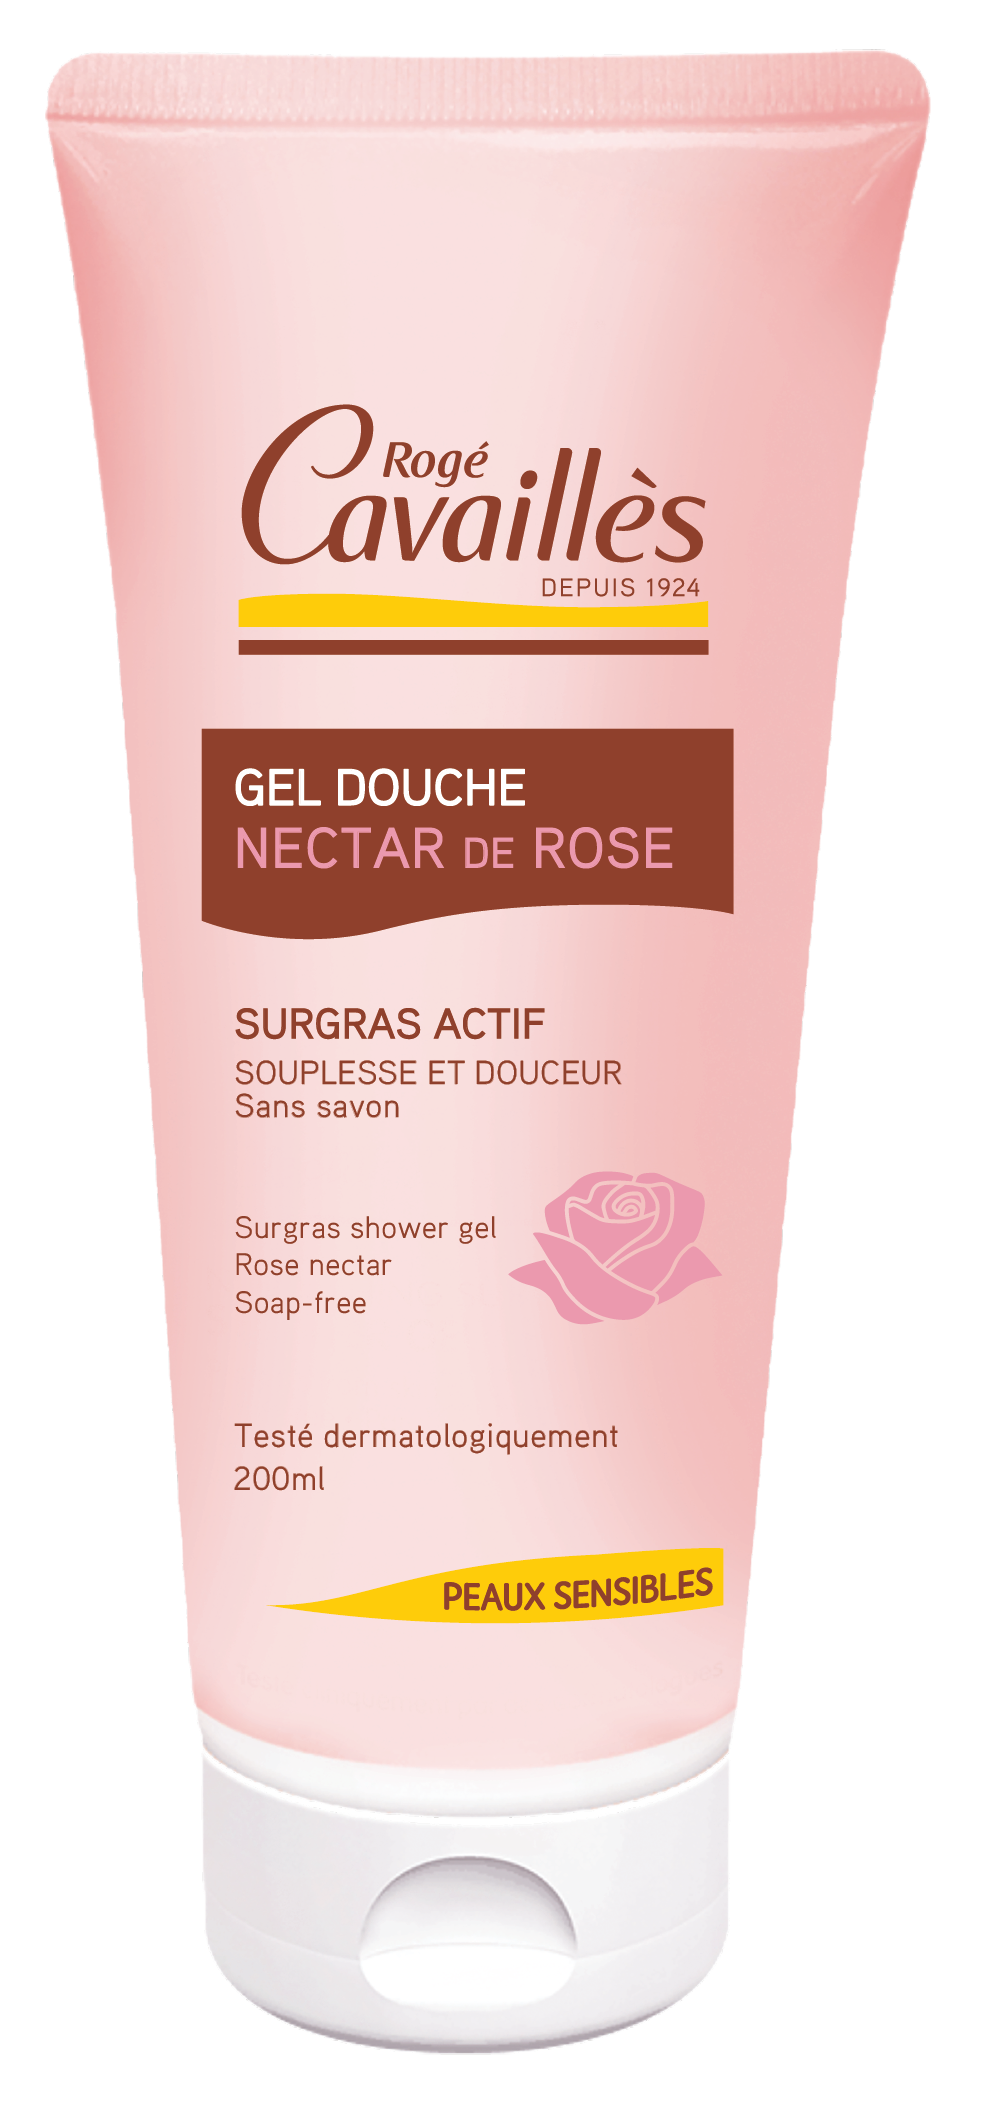 Gel Douche Nourrissant Nectar De Rose 200 Ml